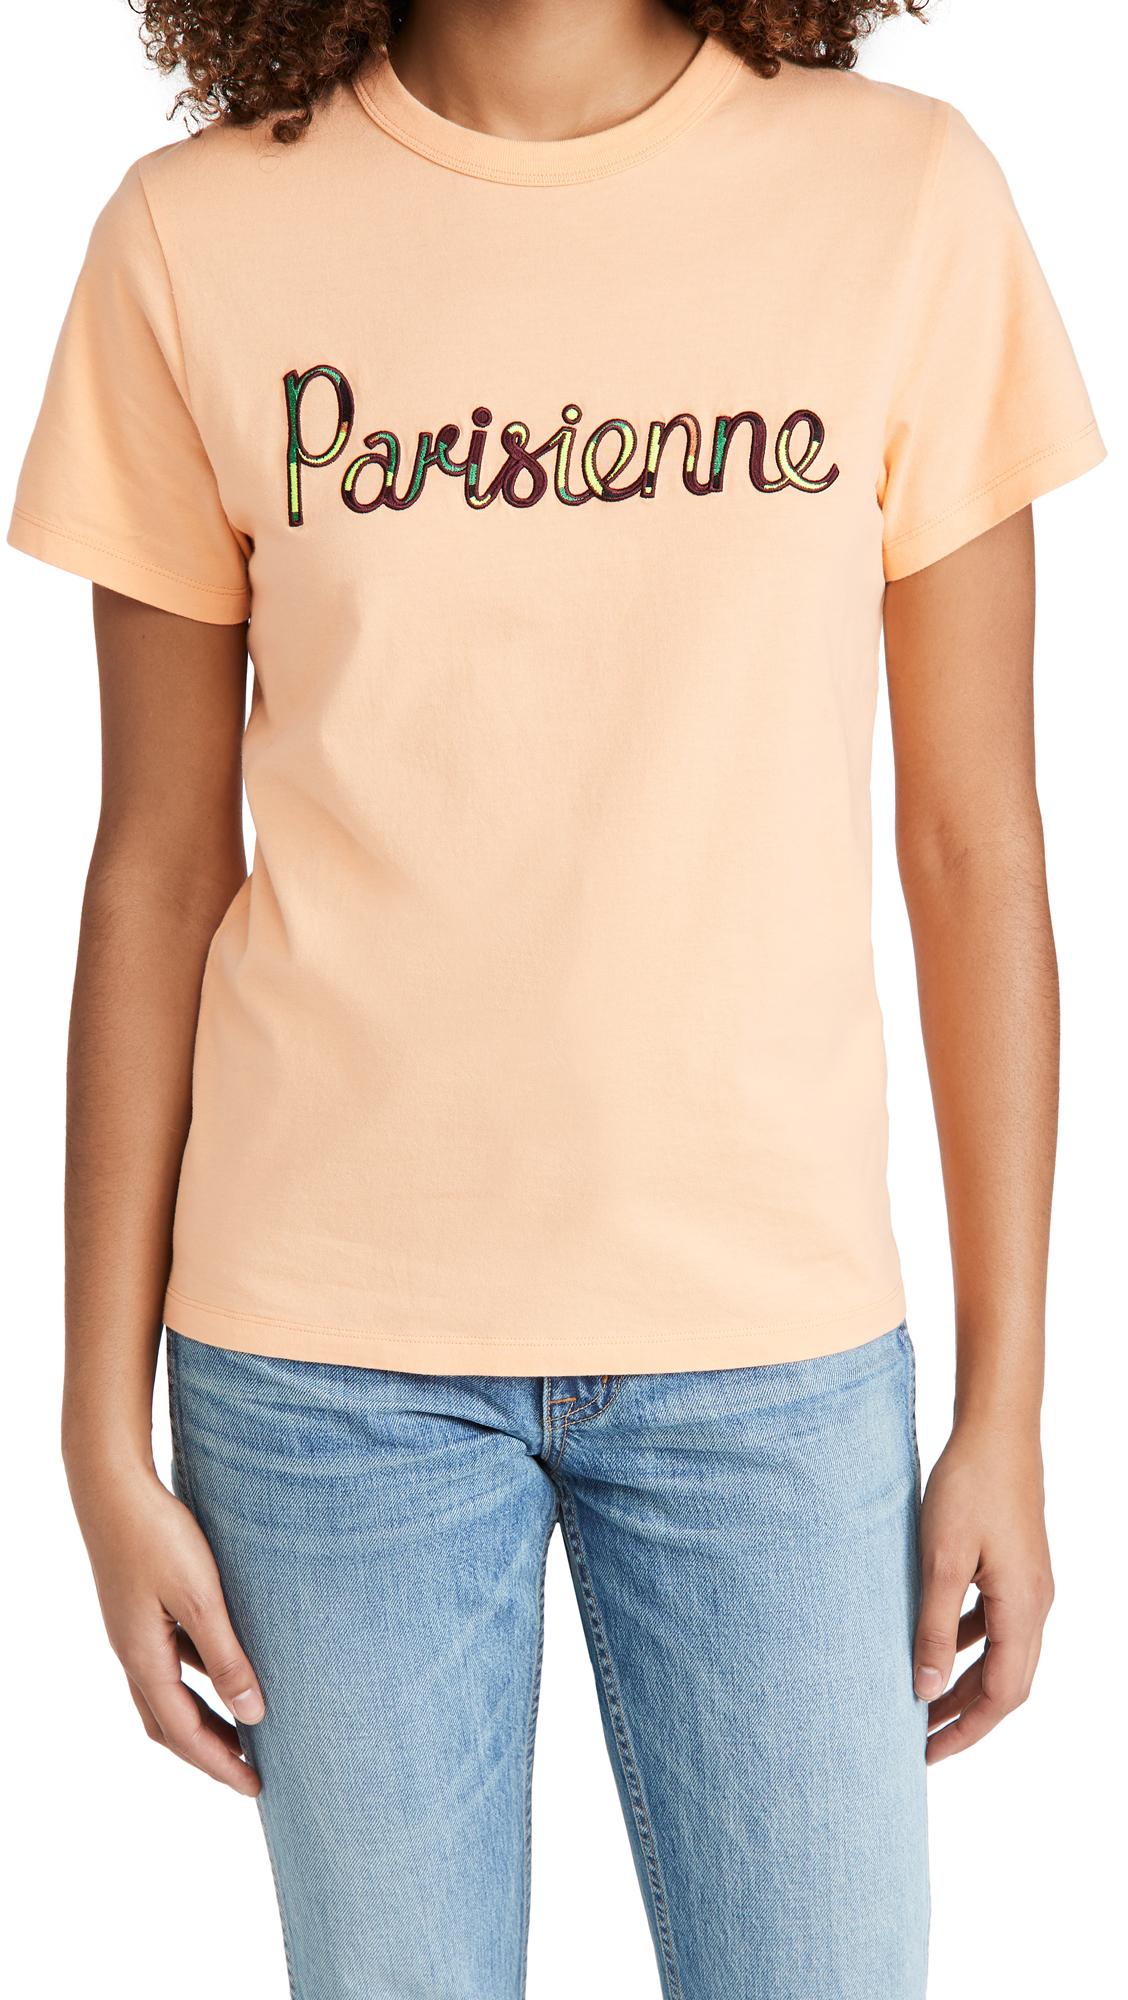 Maison Kitsune Parisienne T-Shirt